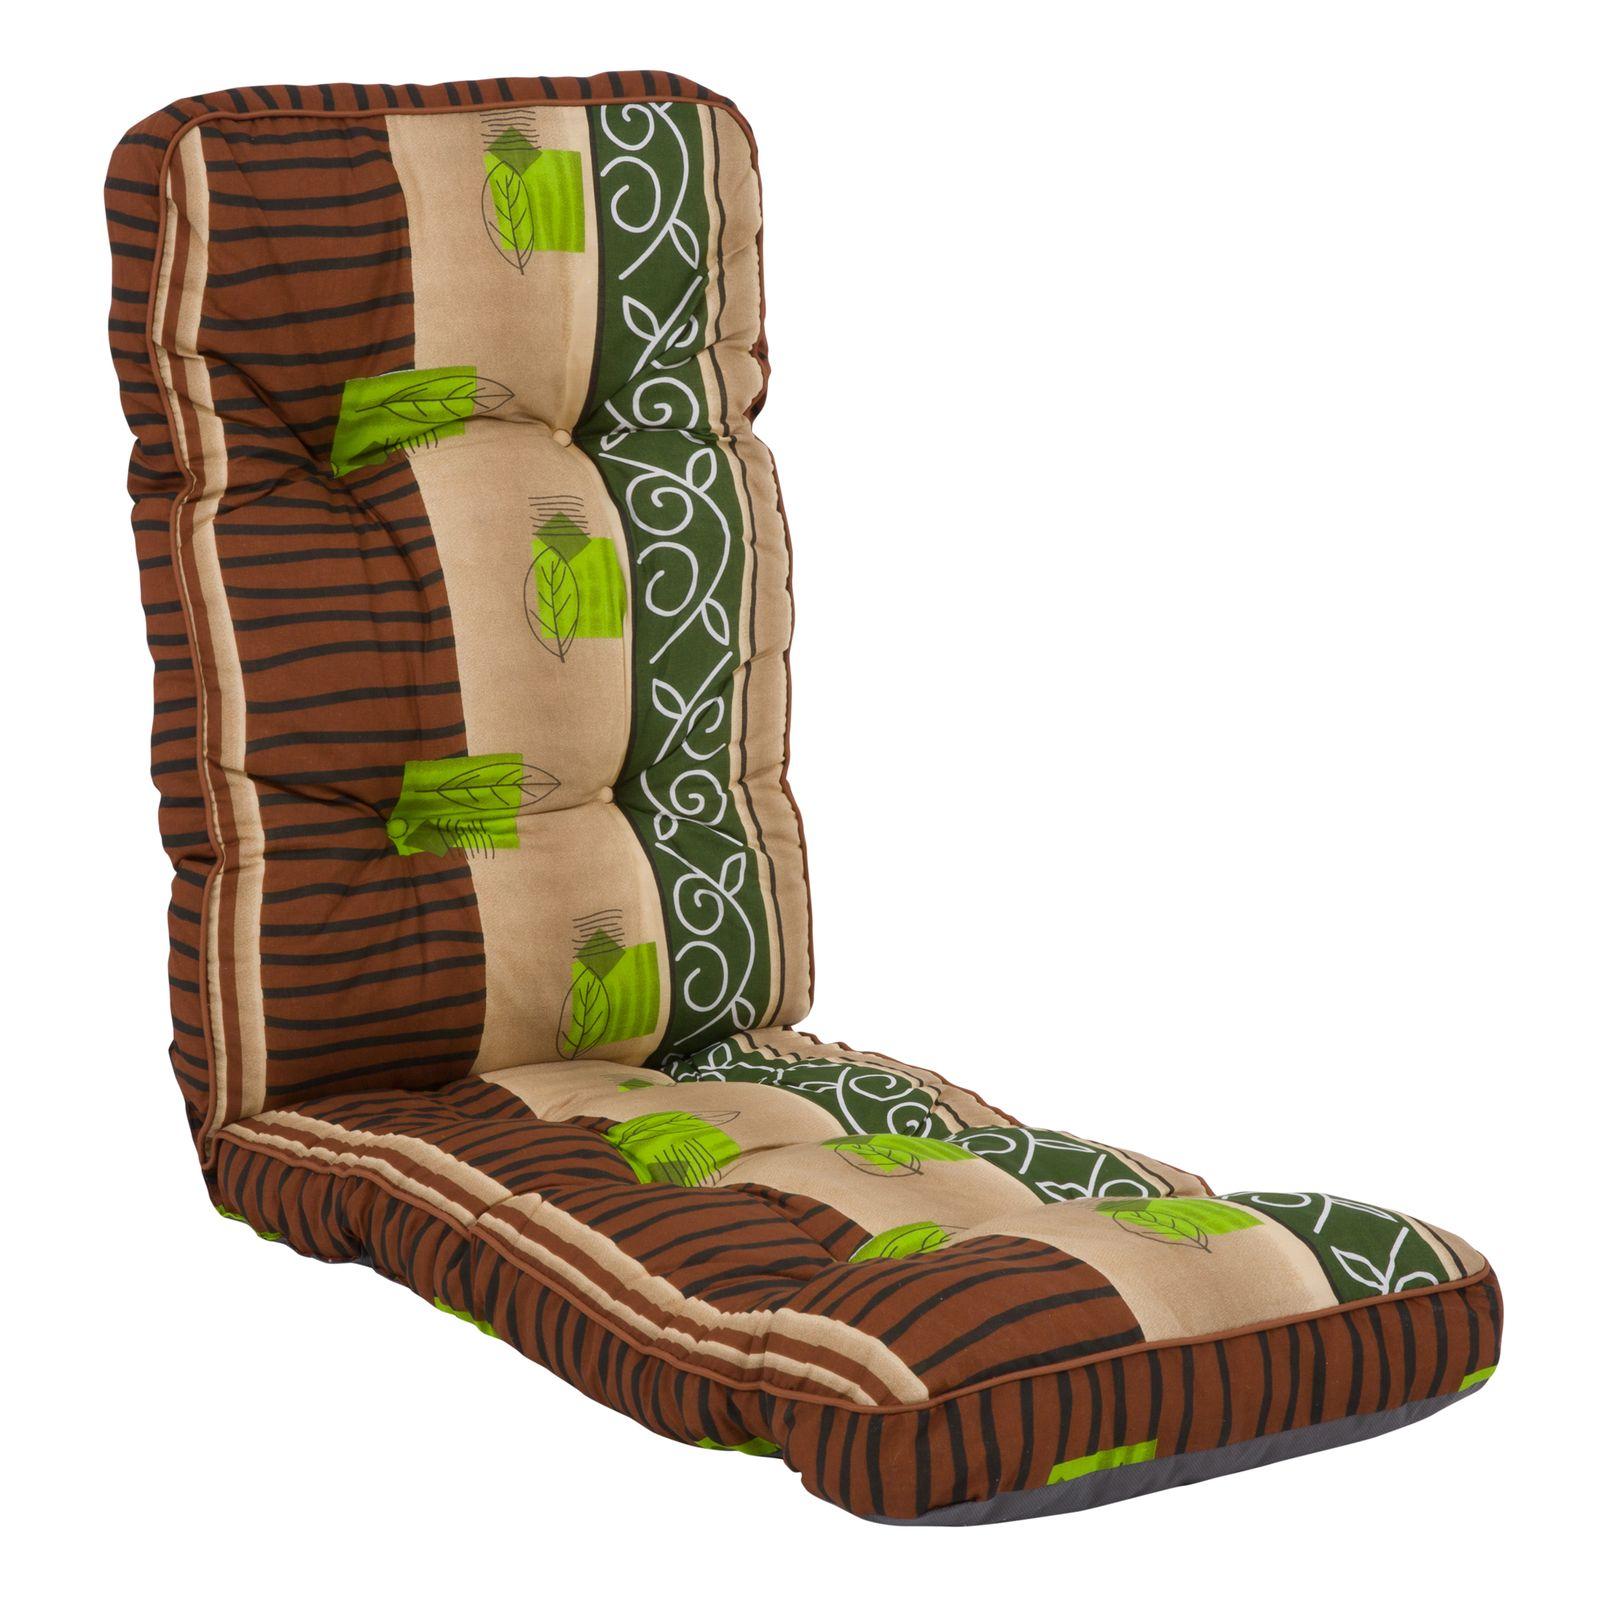 Poduszka na fotel Royal / Lena Plus 8/10 C025-04BB PATIO